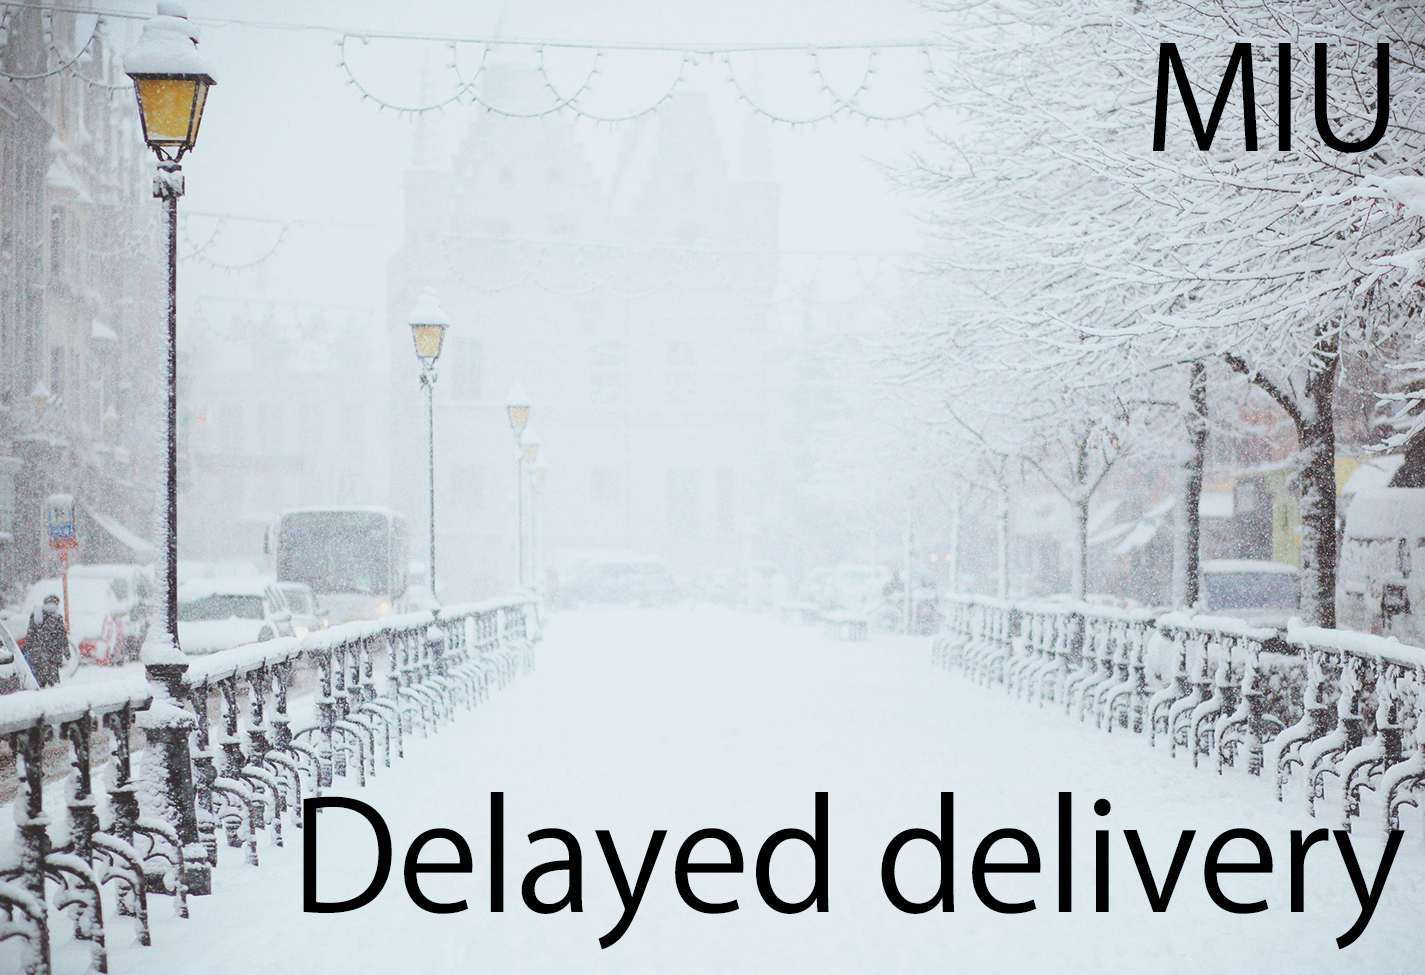 Delayeddelivery